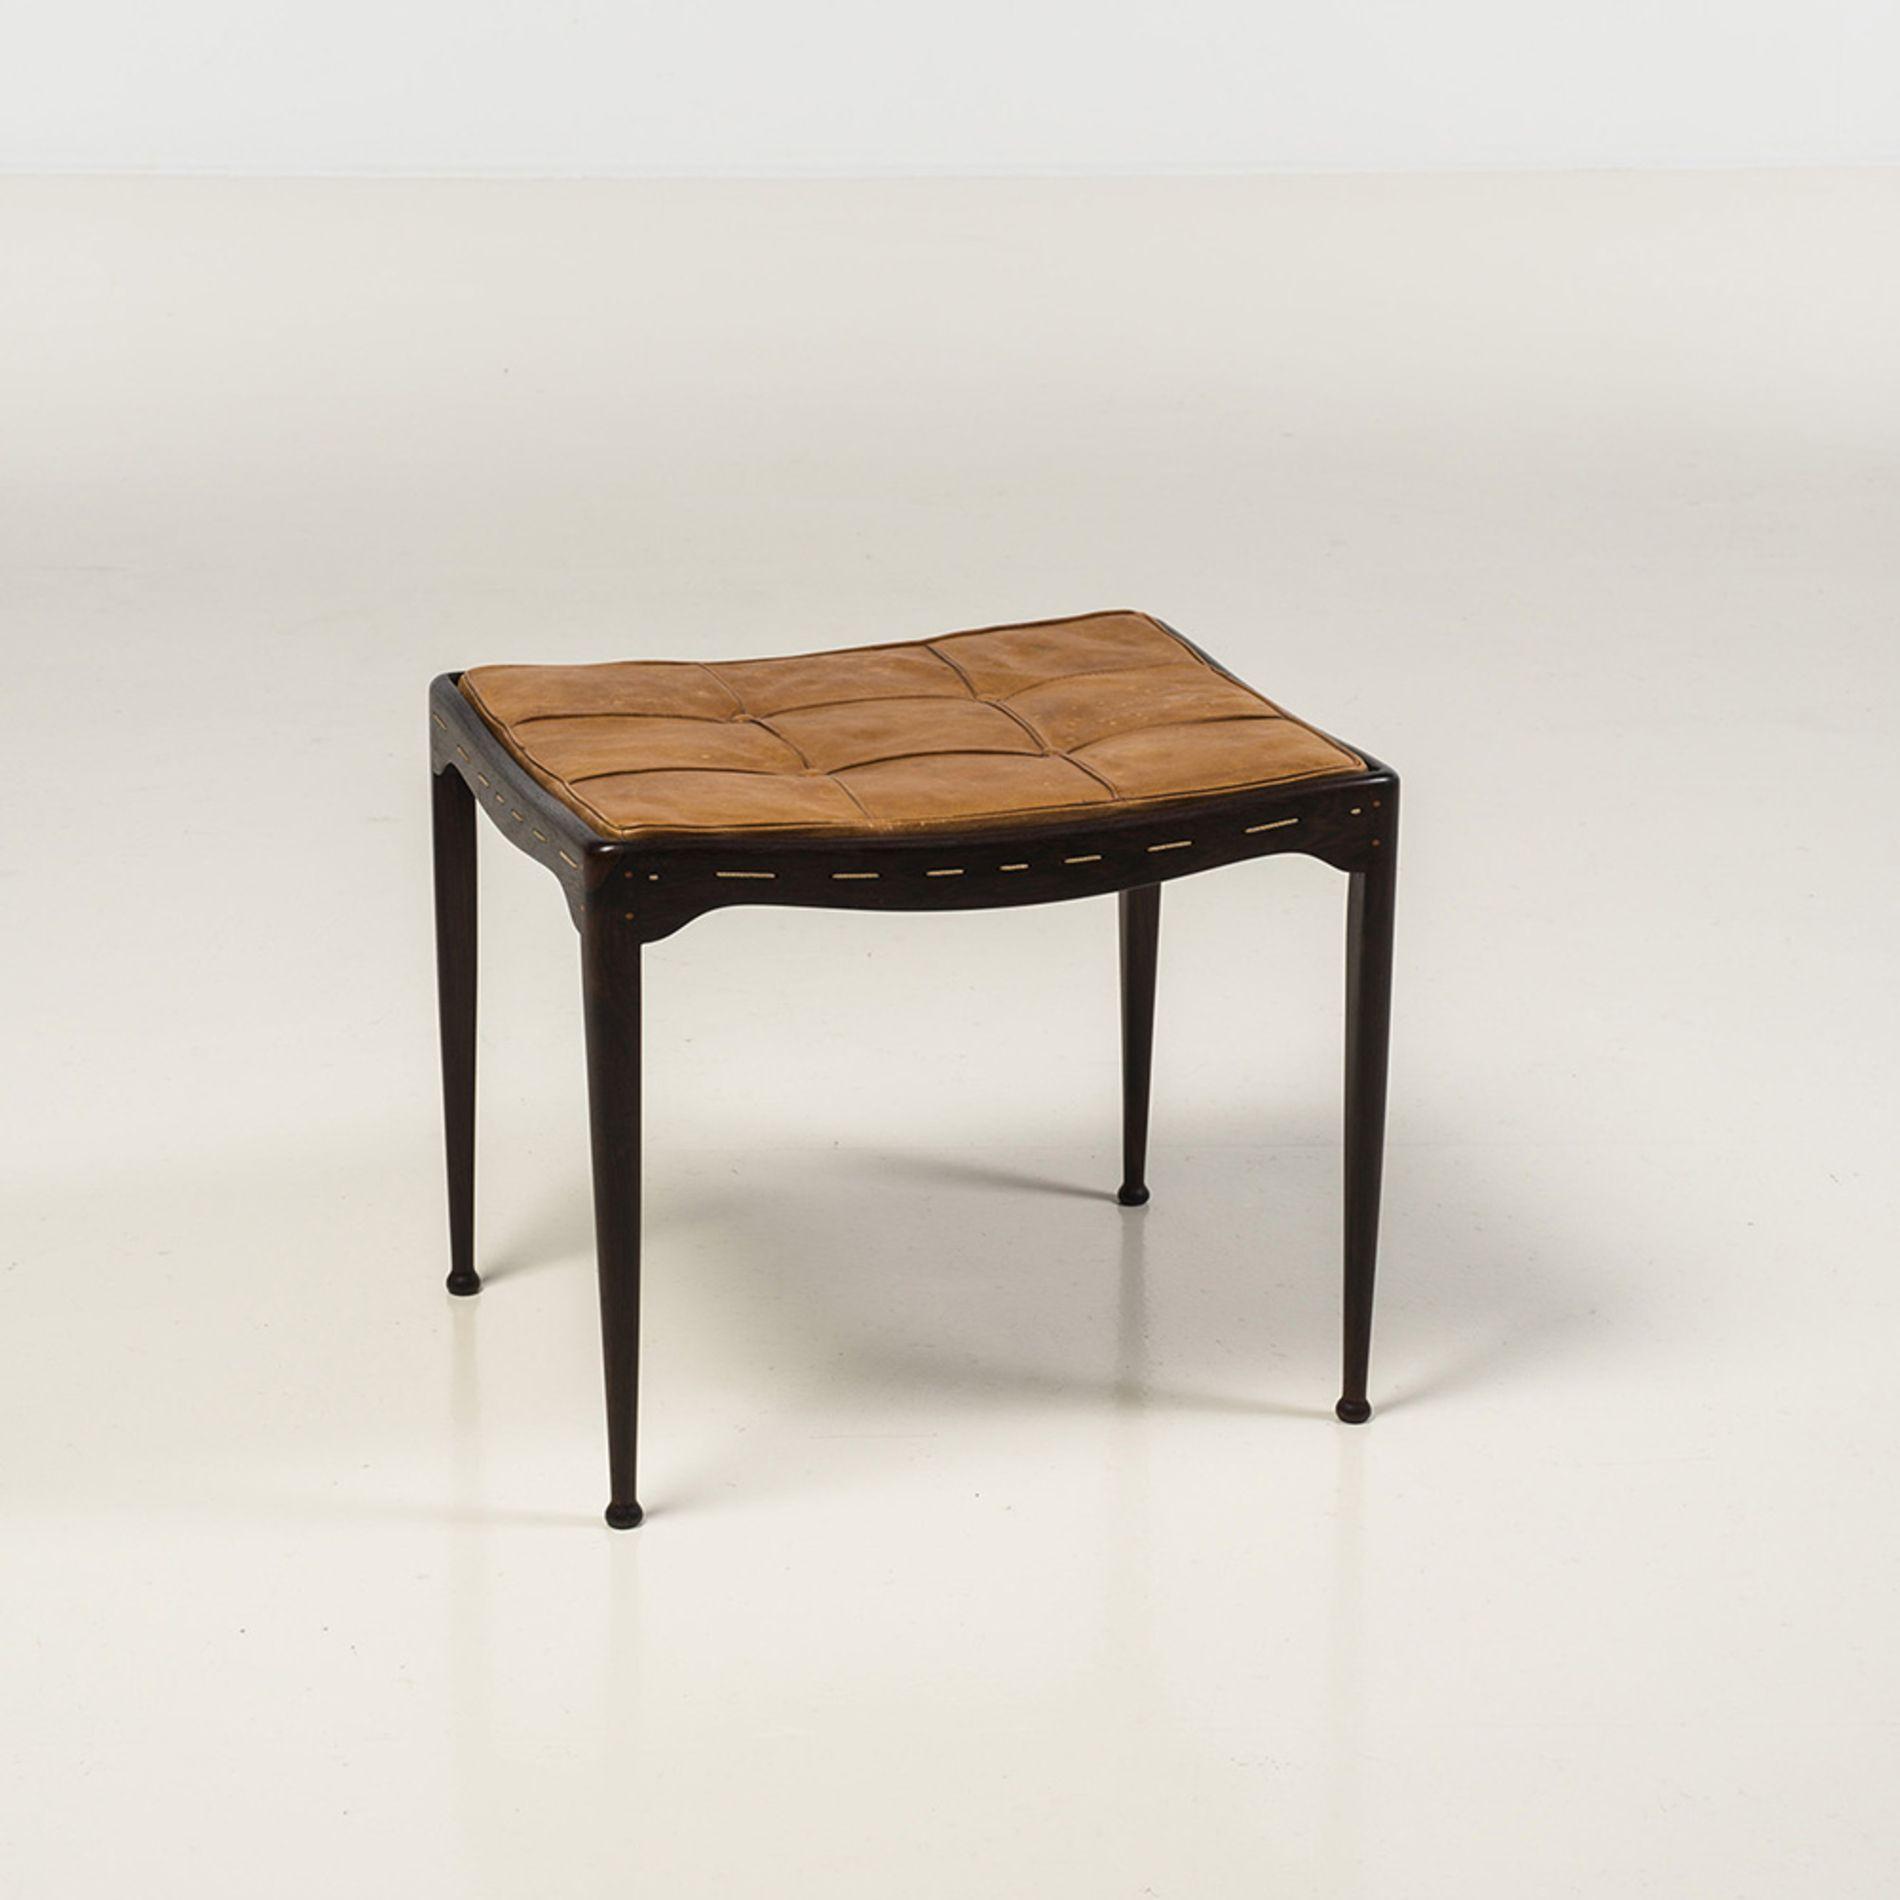 Lemon Wood Furniture ~ Peder moos rosewood lemon wood rope and leather stool